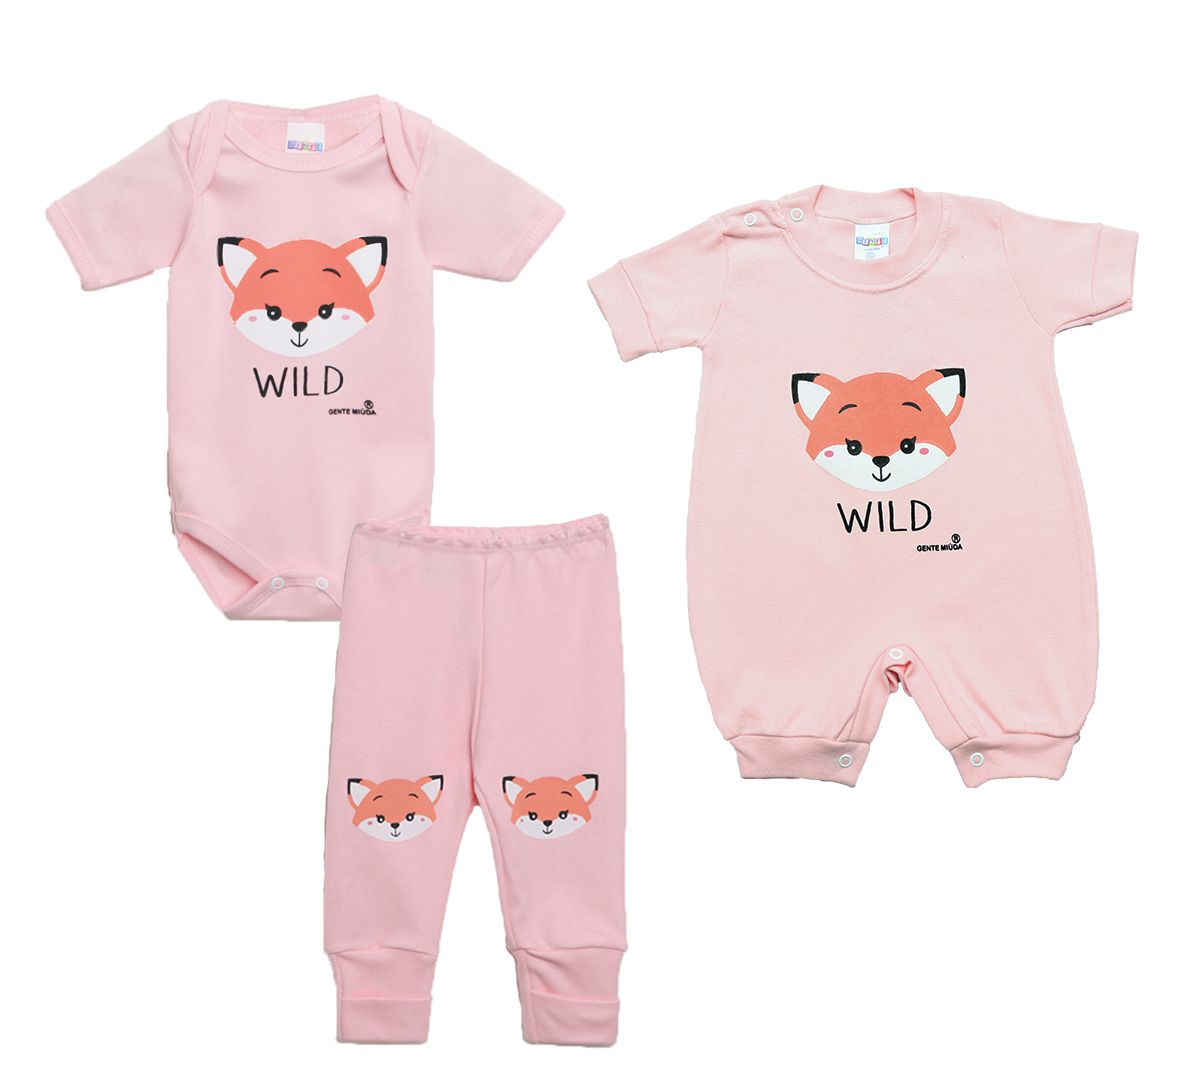 Kit Body Bebê com 3 Peças Menina Raposa Rosa Claro